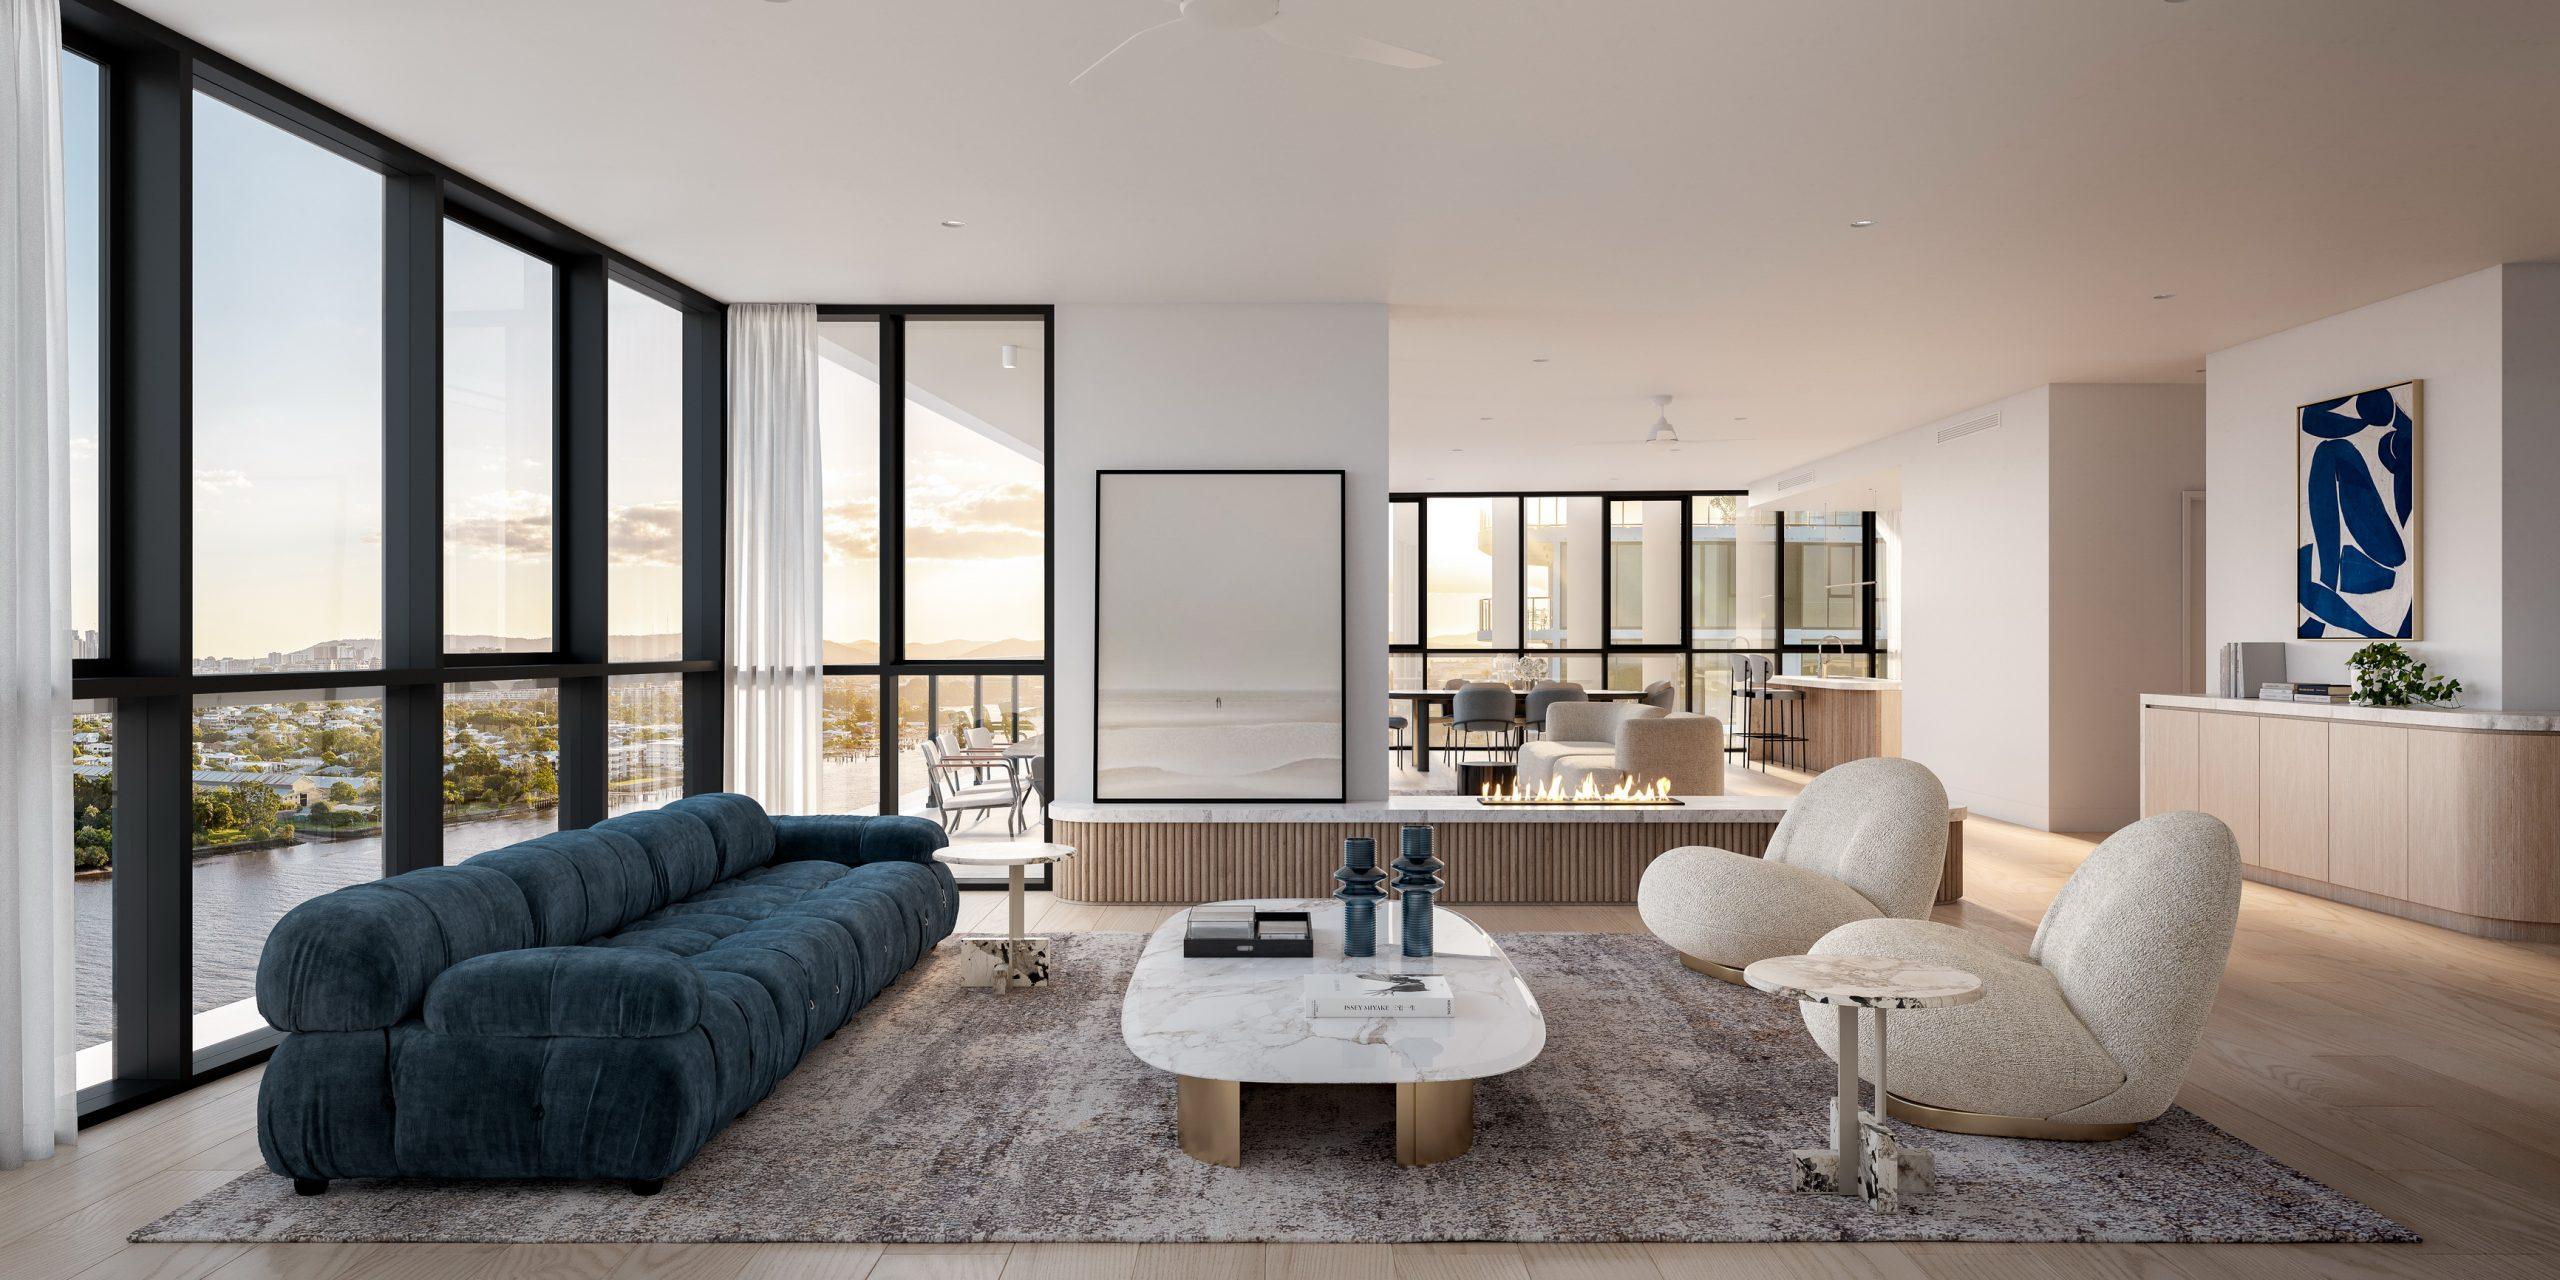 Rivello-queensland-render-3d-fkd-studio-architecture-luxury-interior-design-penthouse-living